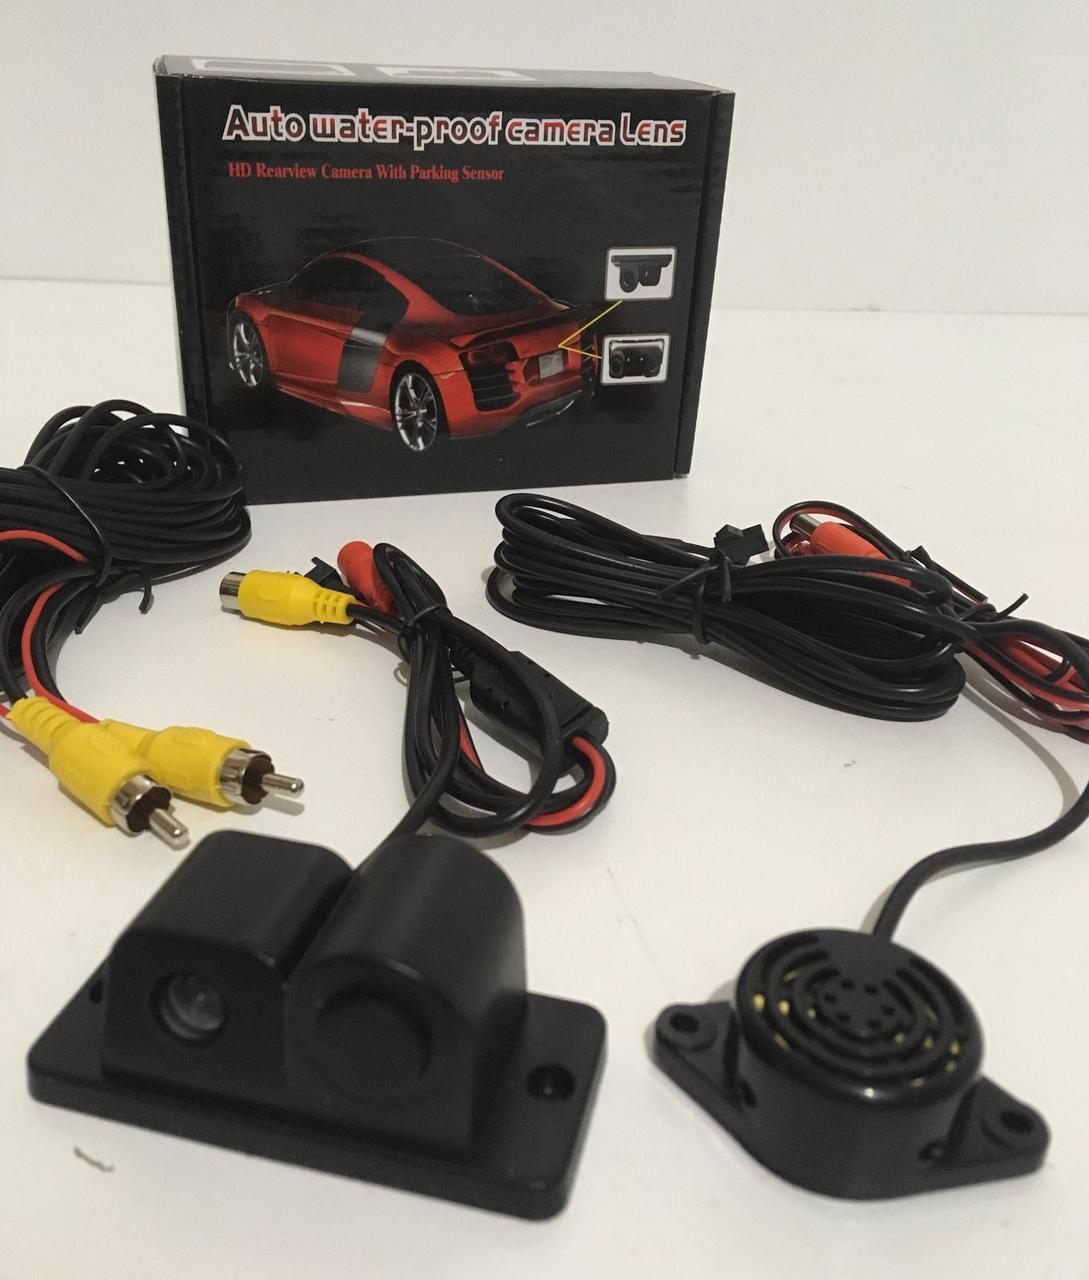 Автокамери з парктроніком Auto Water-Proof Camera Lens CAR CAM. 01R (50 шт/ящ)